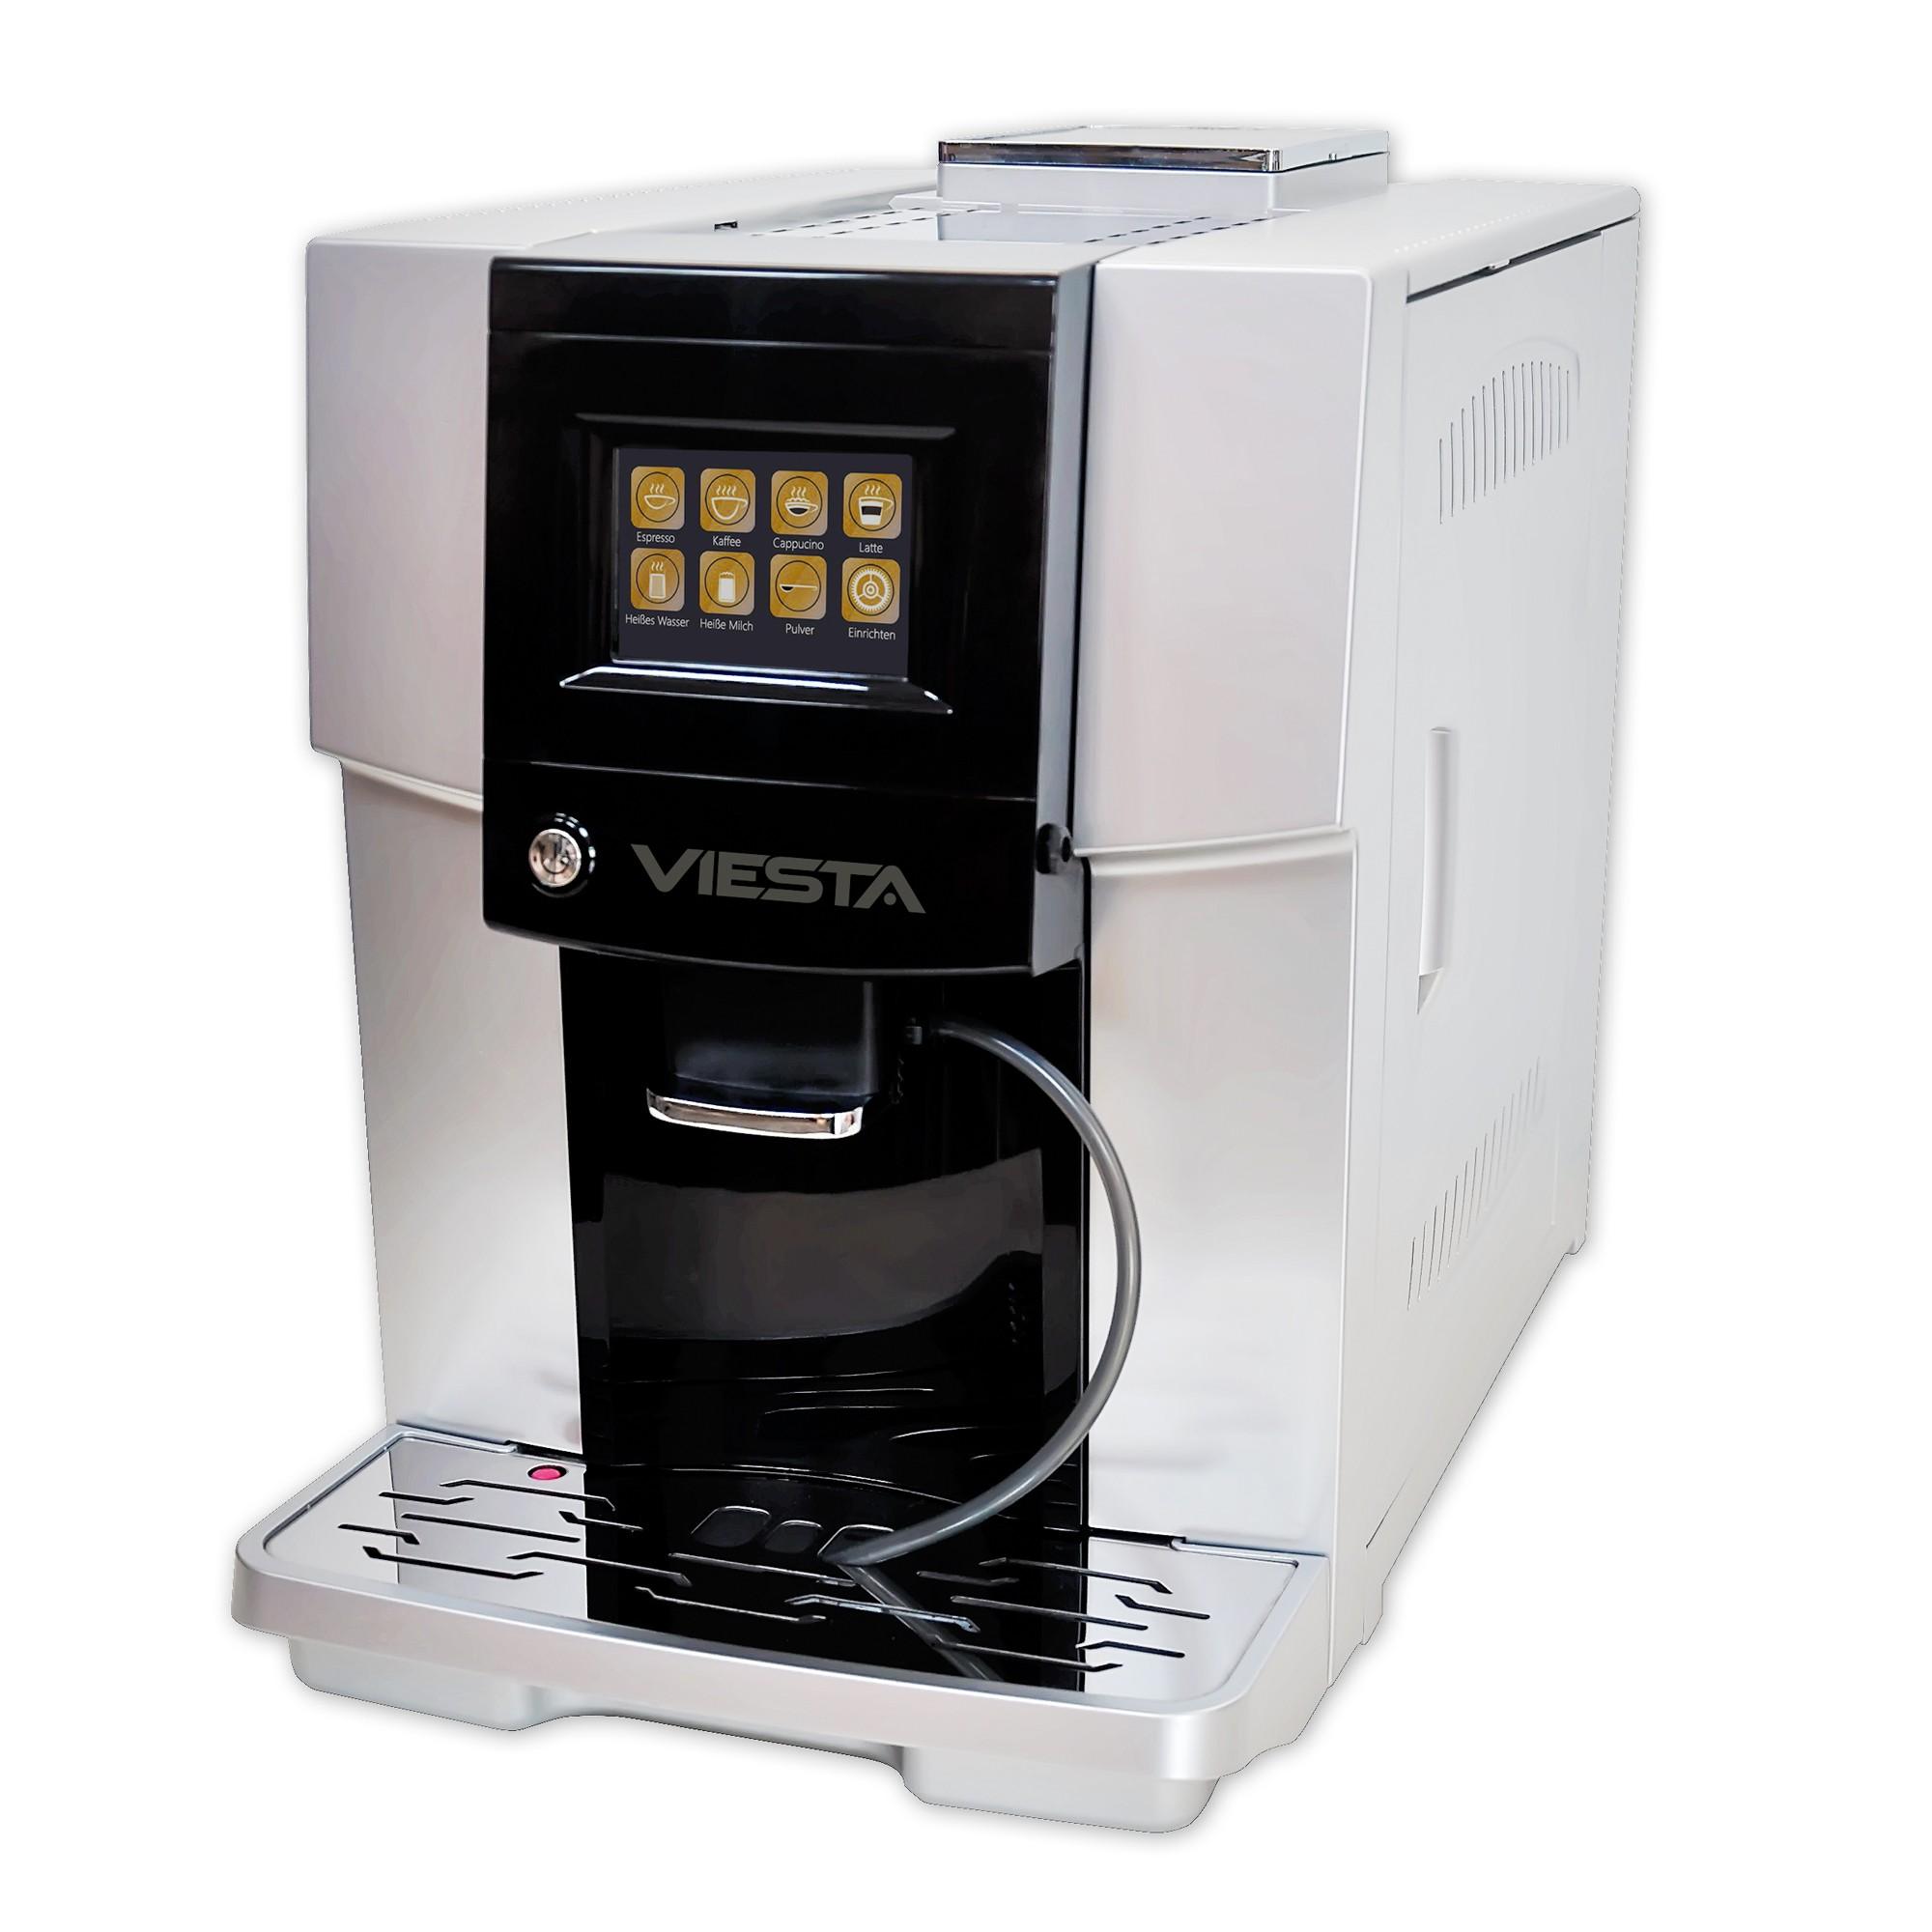 viesta one touch 500 kaffeevollautomat kaffeemaschine mit. Black Bedroom Furniture Sets. Home Design Ideas